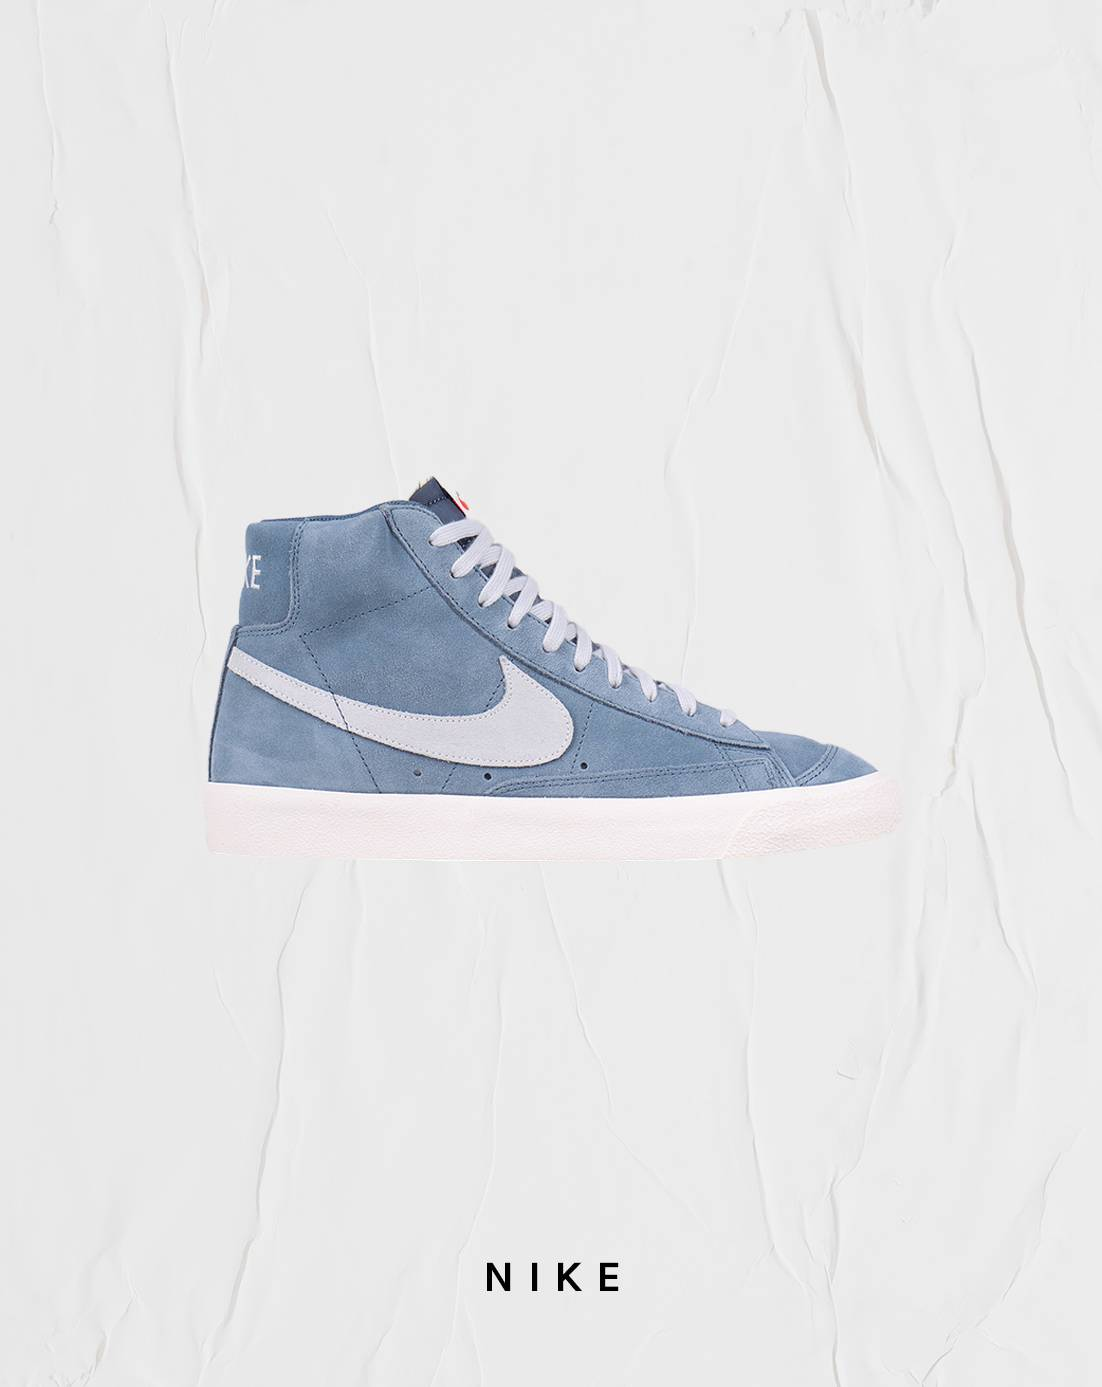 Nike Sportswear Swoosh Pants Sequoia White Cd0421-356